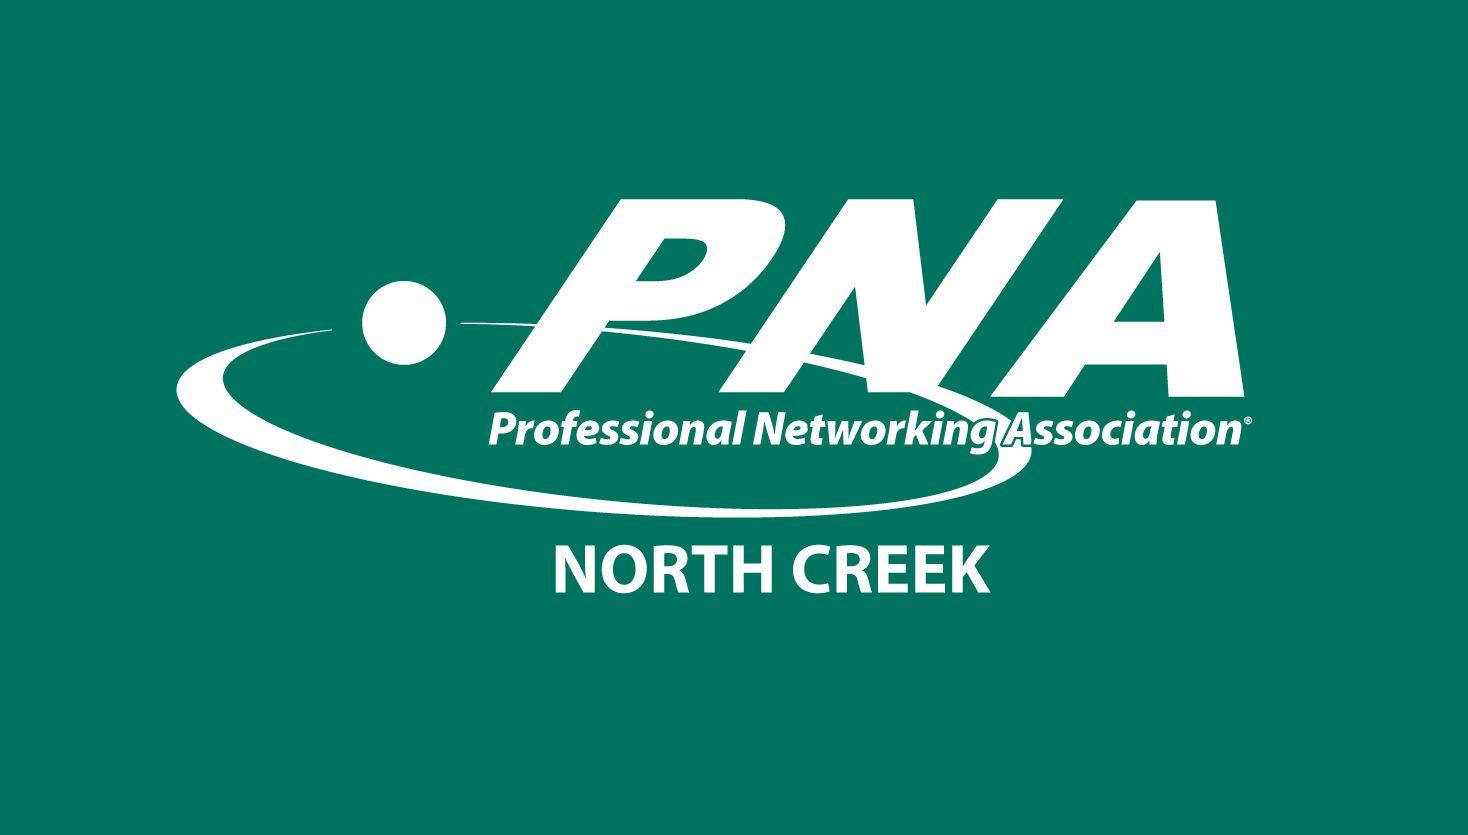 PNA - North Creek